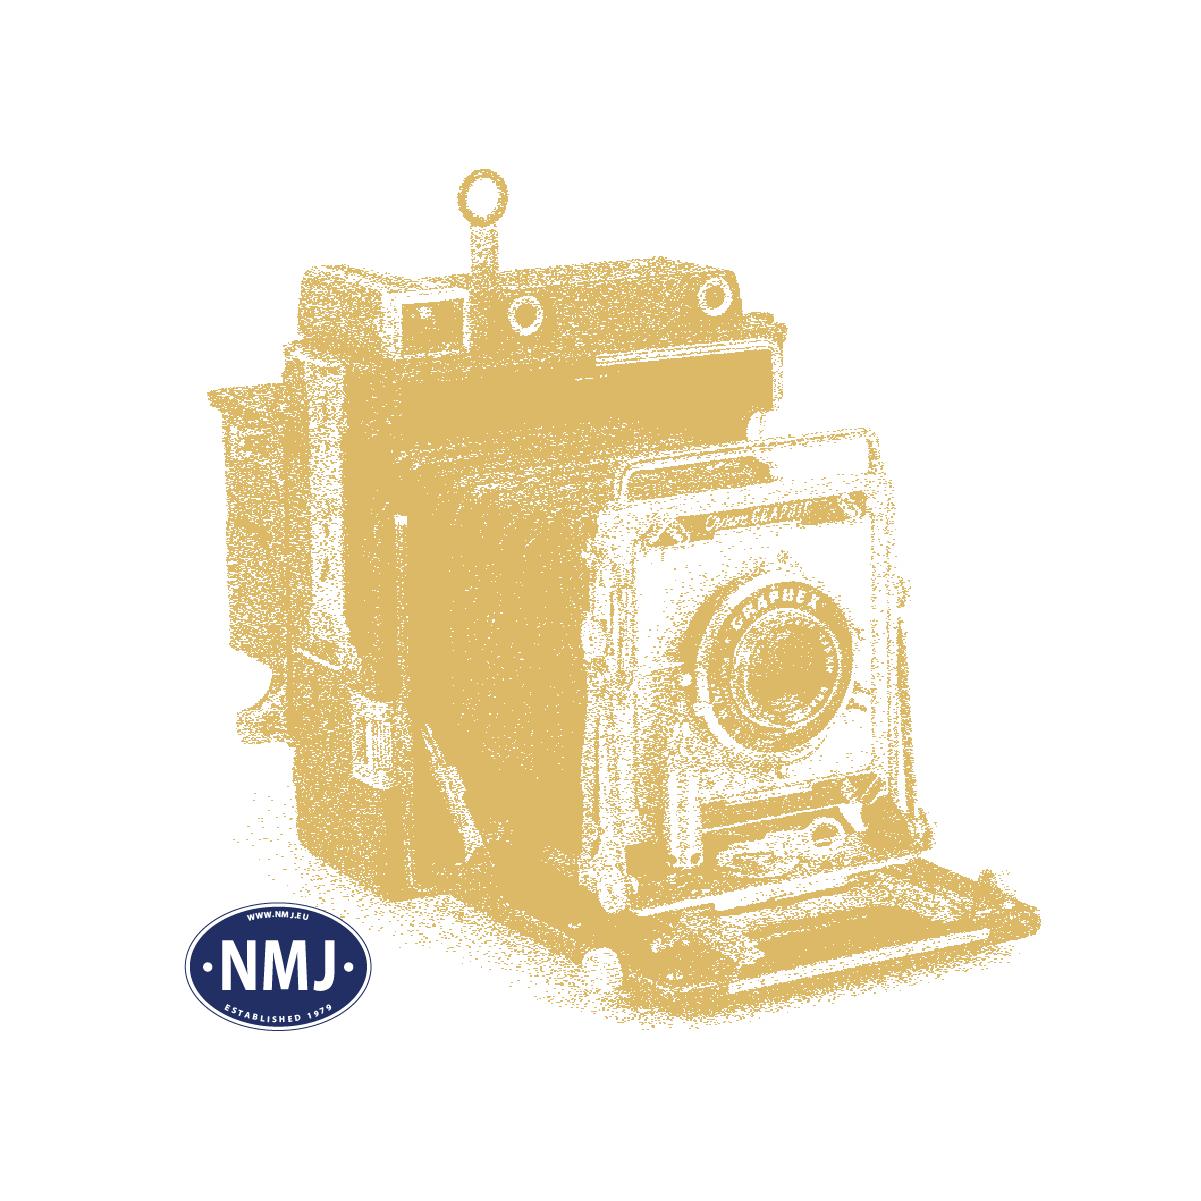 Topline Lokomotiver, nmj-topline-145303-cfl-1601-early-version-0-scale-1-45-dc, NMJT145303